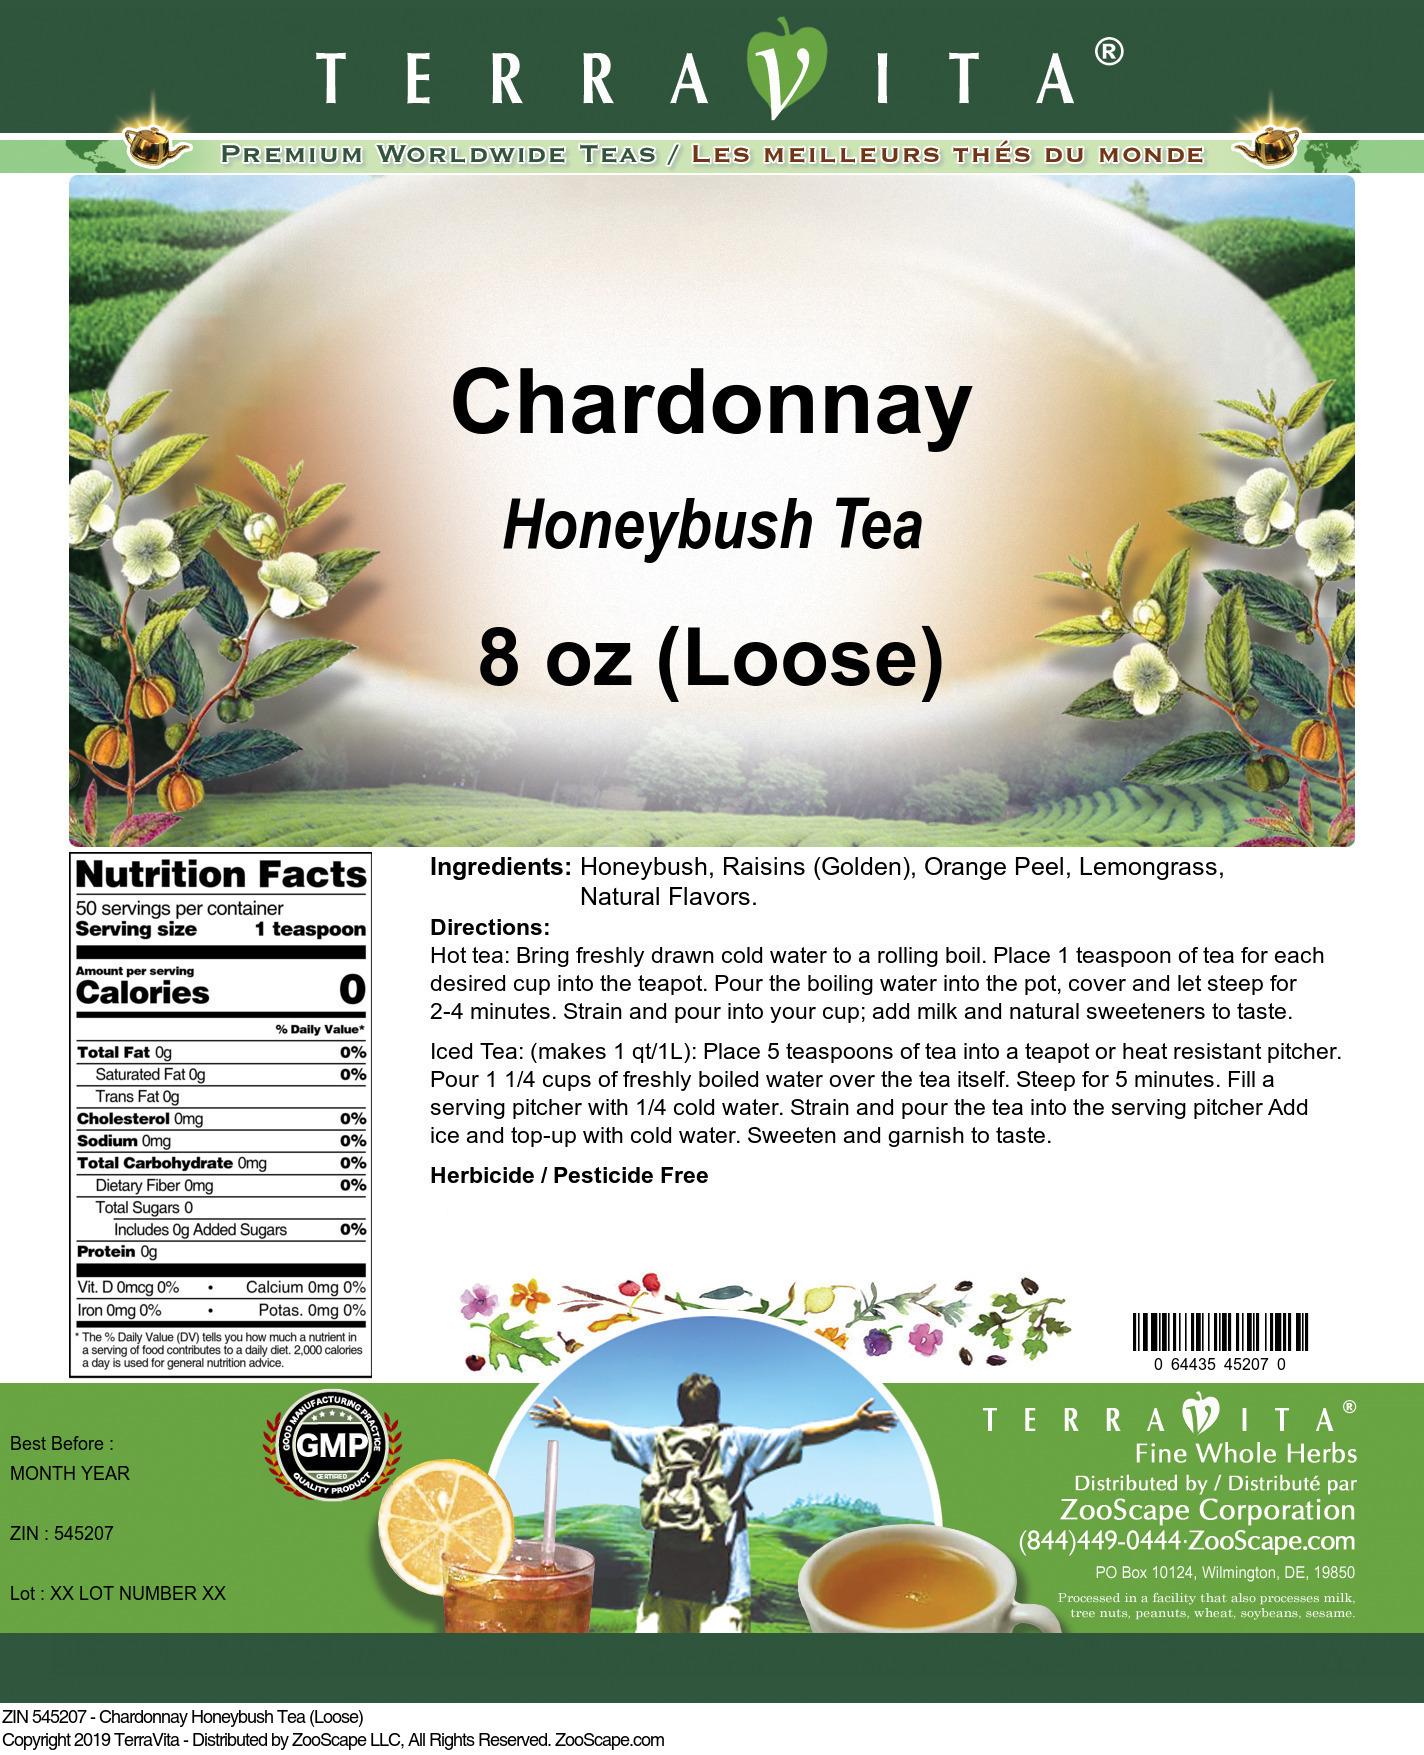 Chardonnay Honeybush Tea